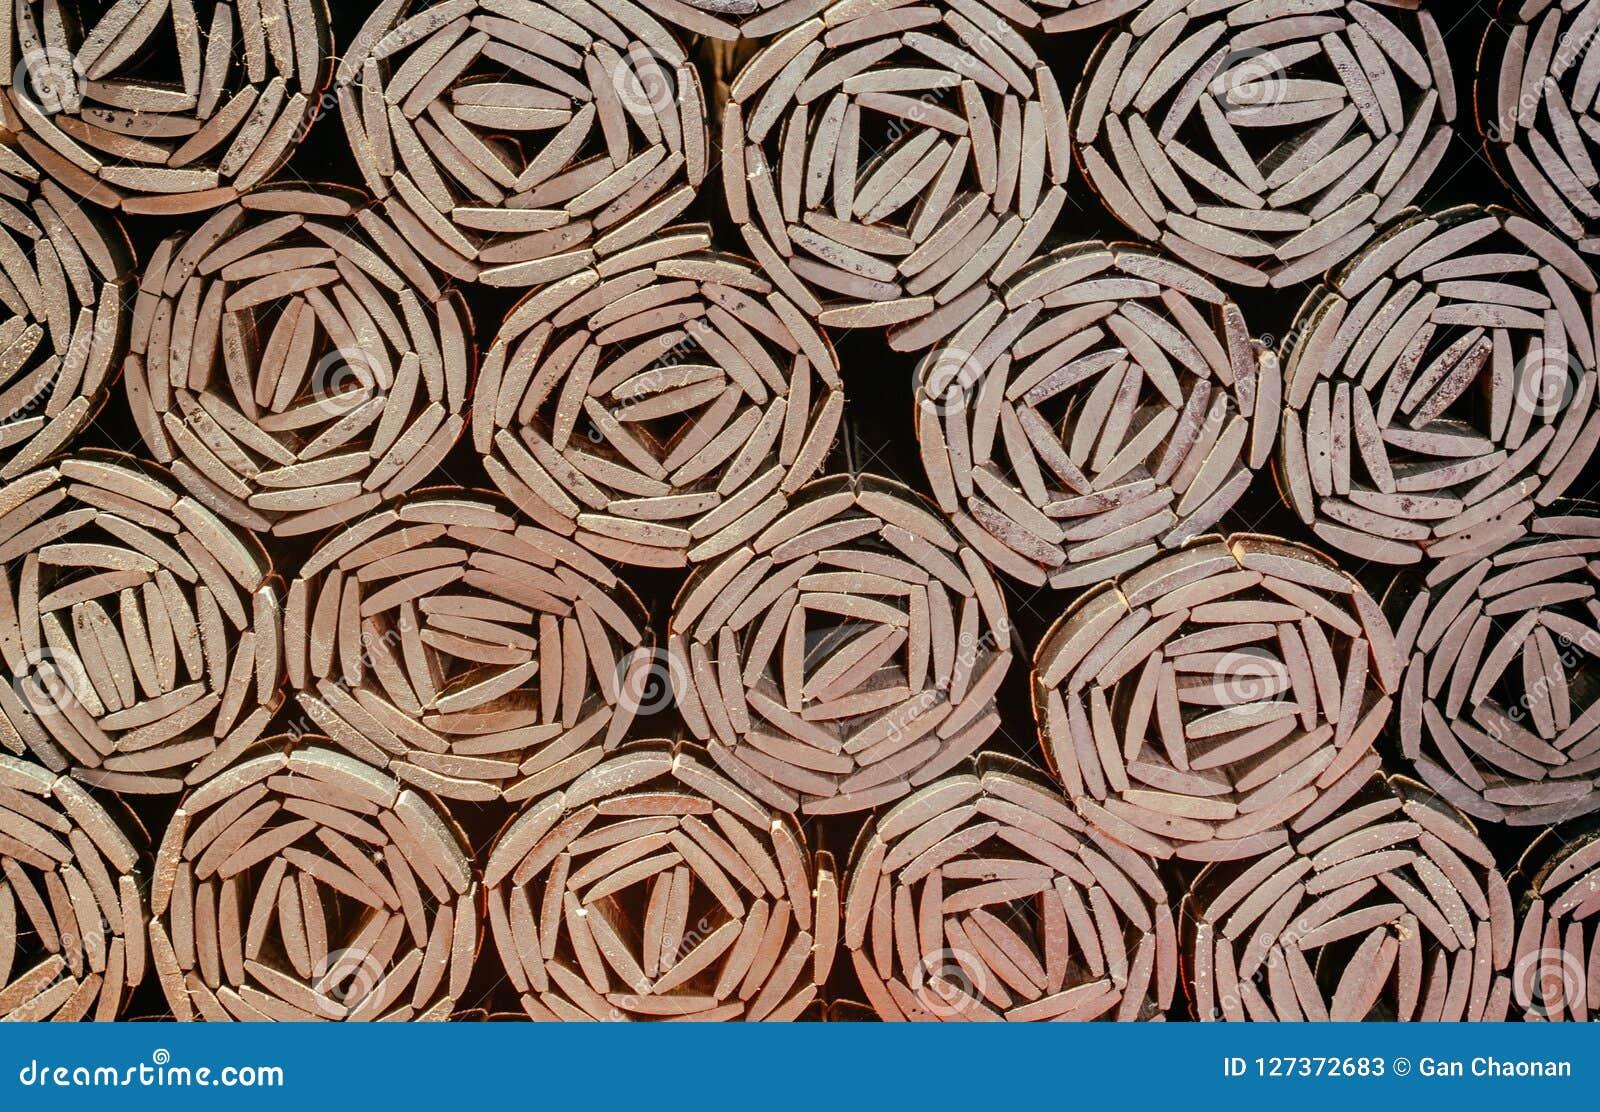 Rollos de bambú de fotos de la esquina superior